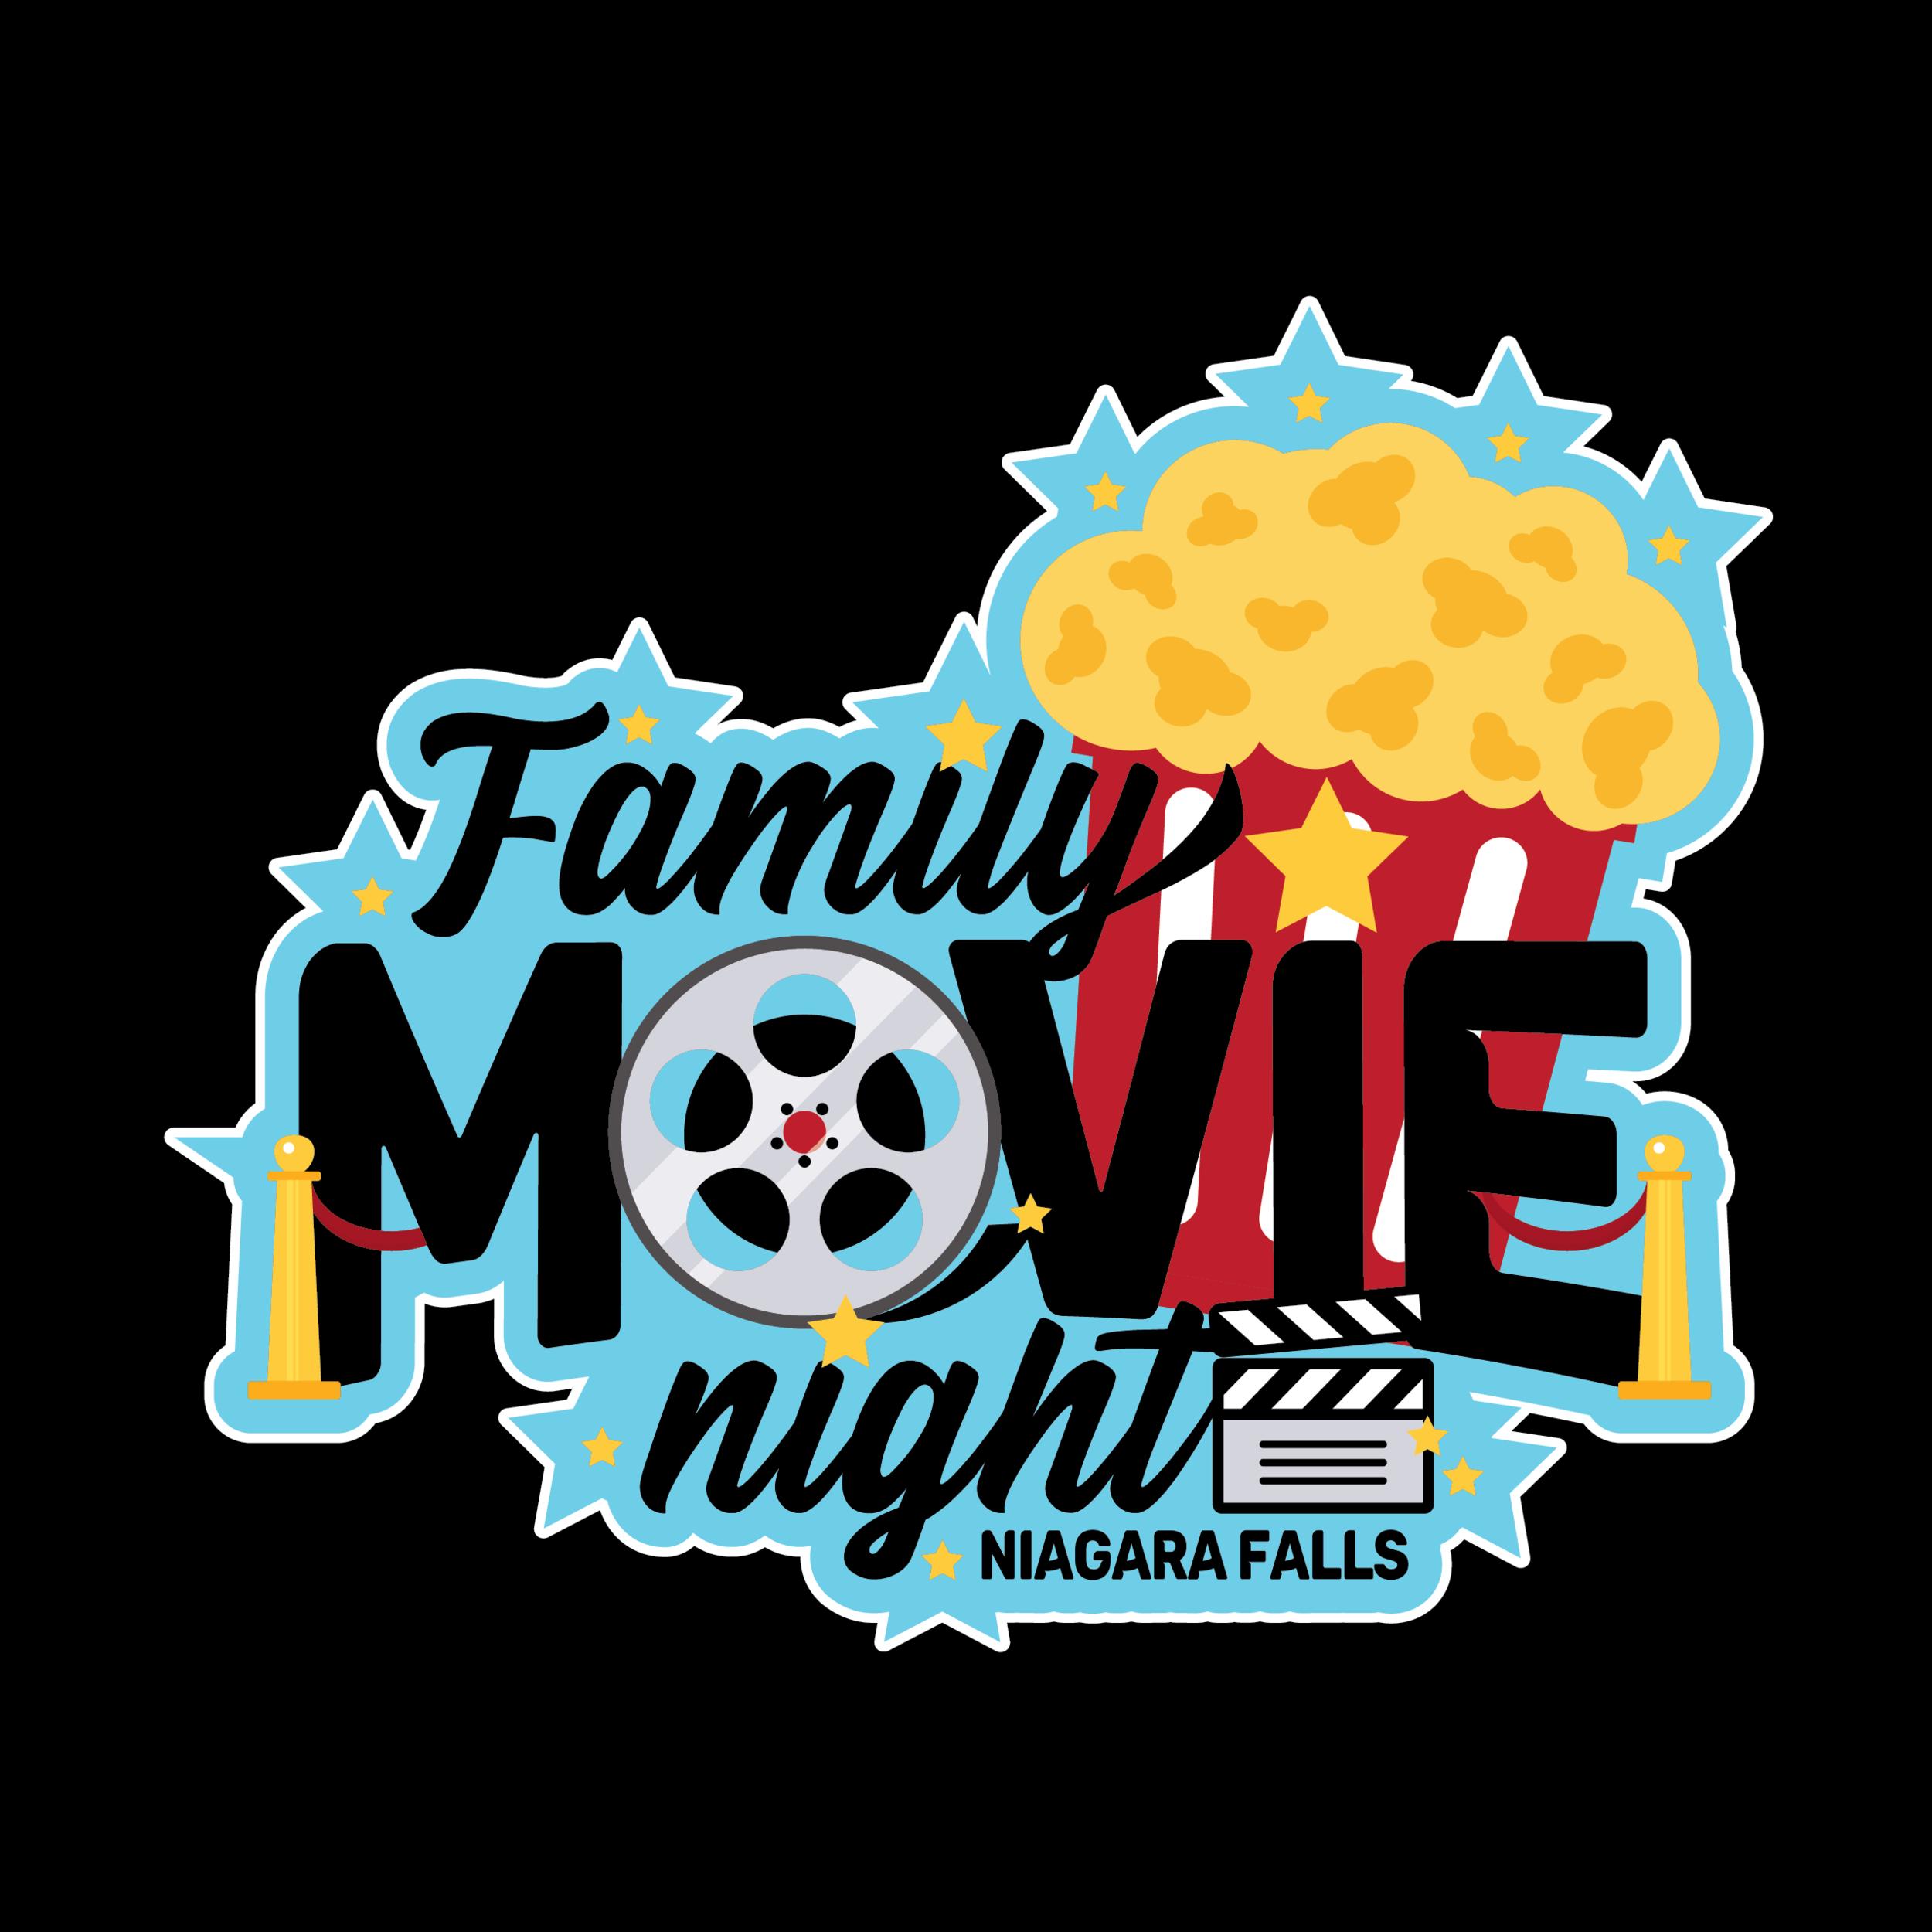 NFCD_Family Movie Night_logo 062618_HiR-01.png